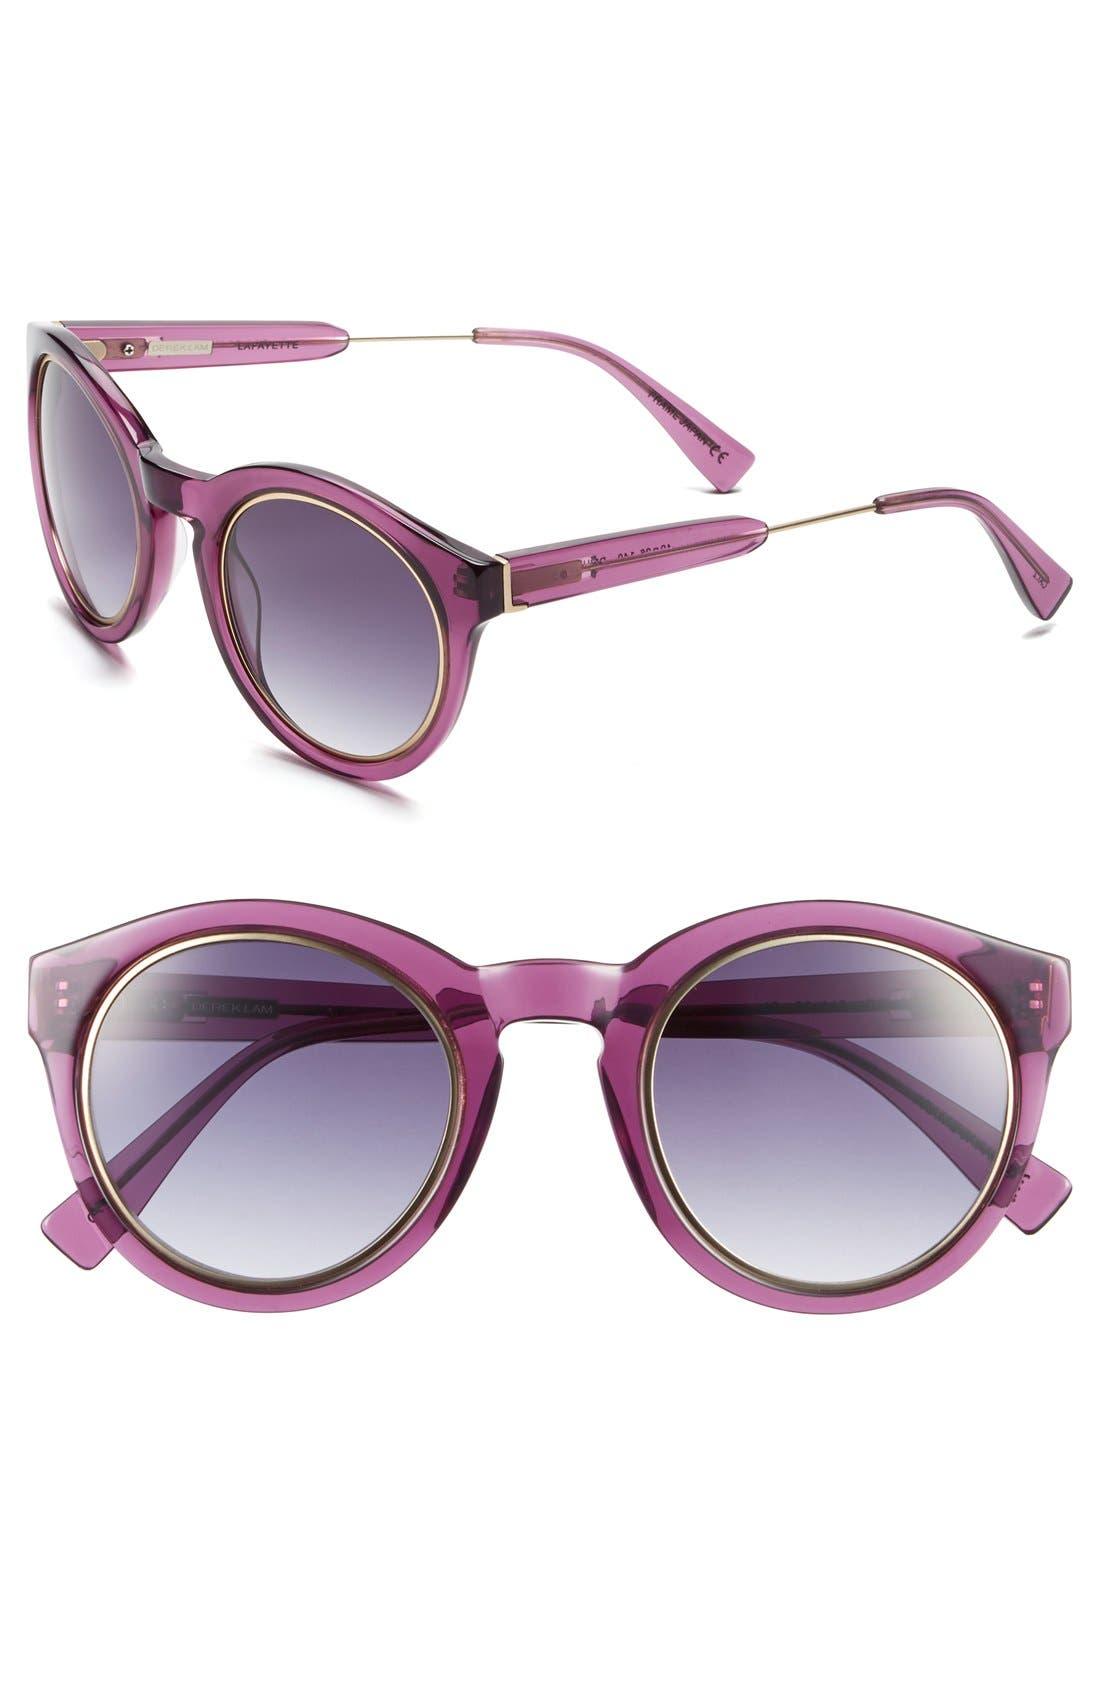 Main Image - Derek Lam 'Lafayette' 49mm Sunglasses